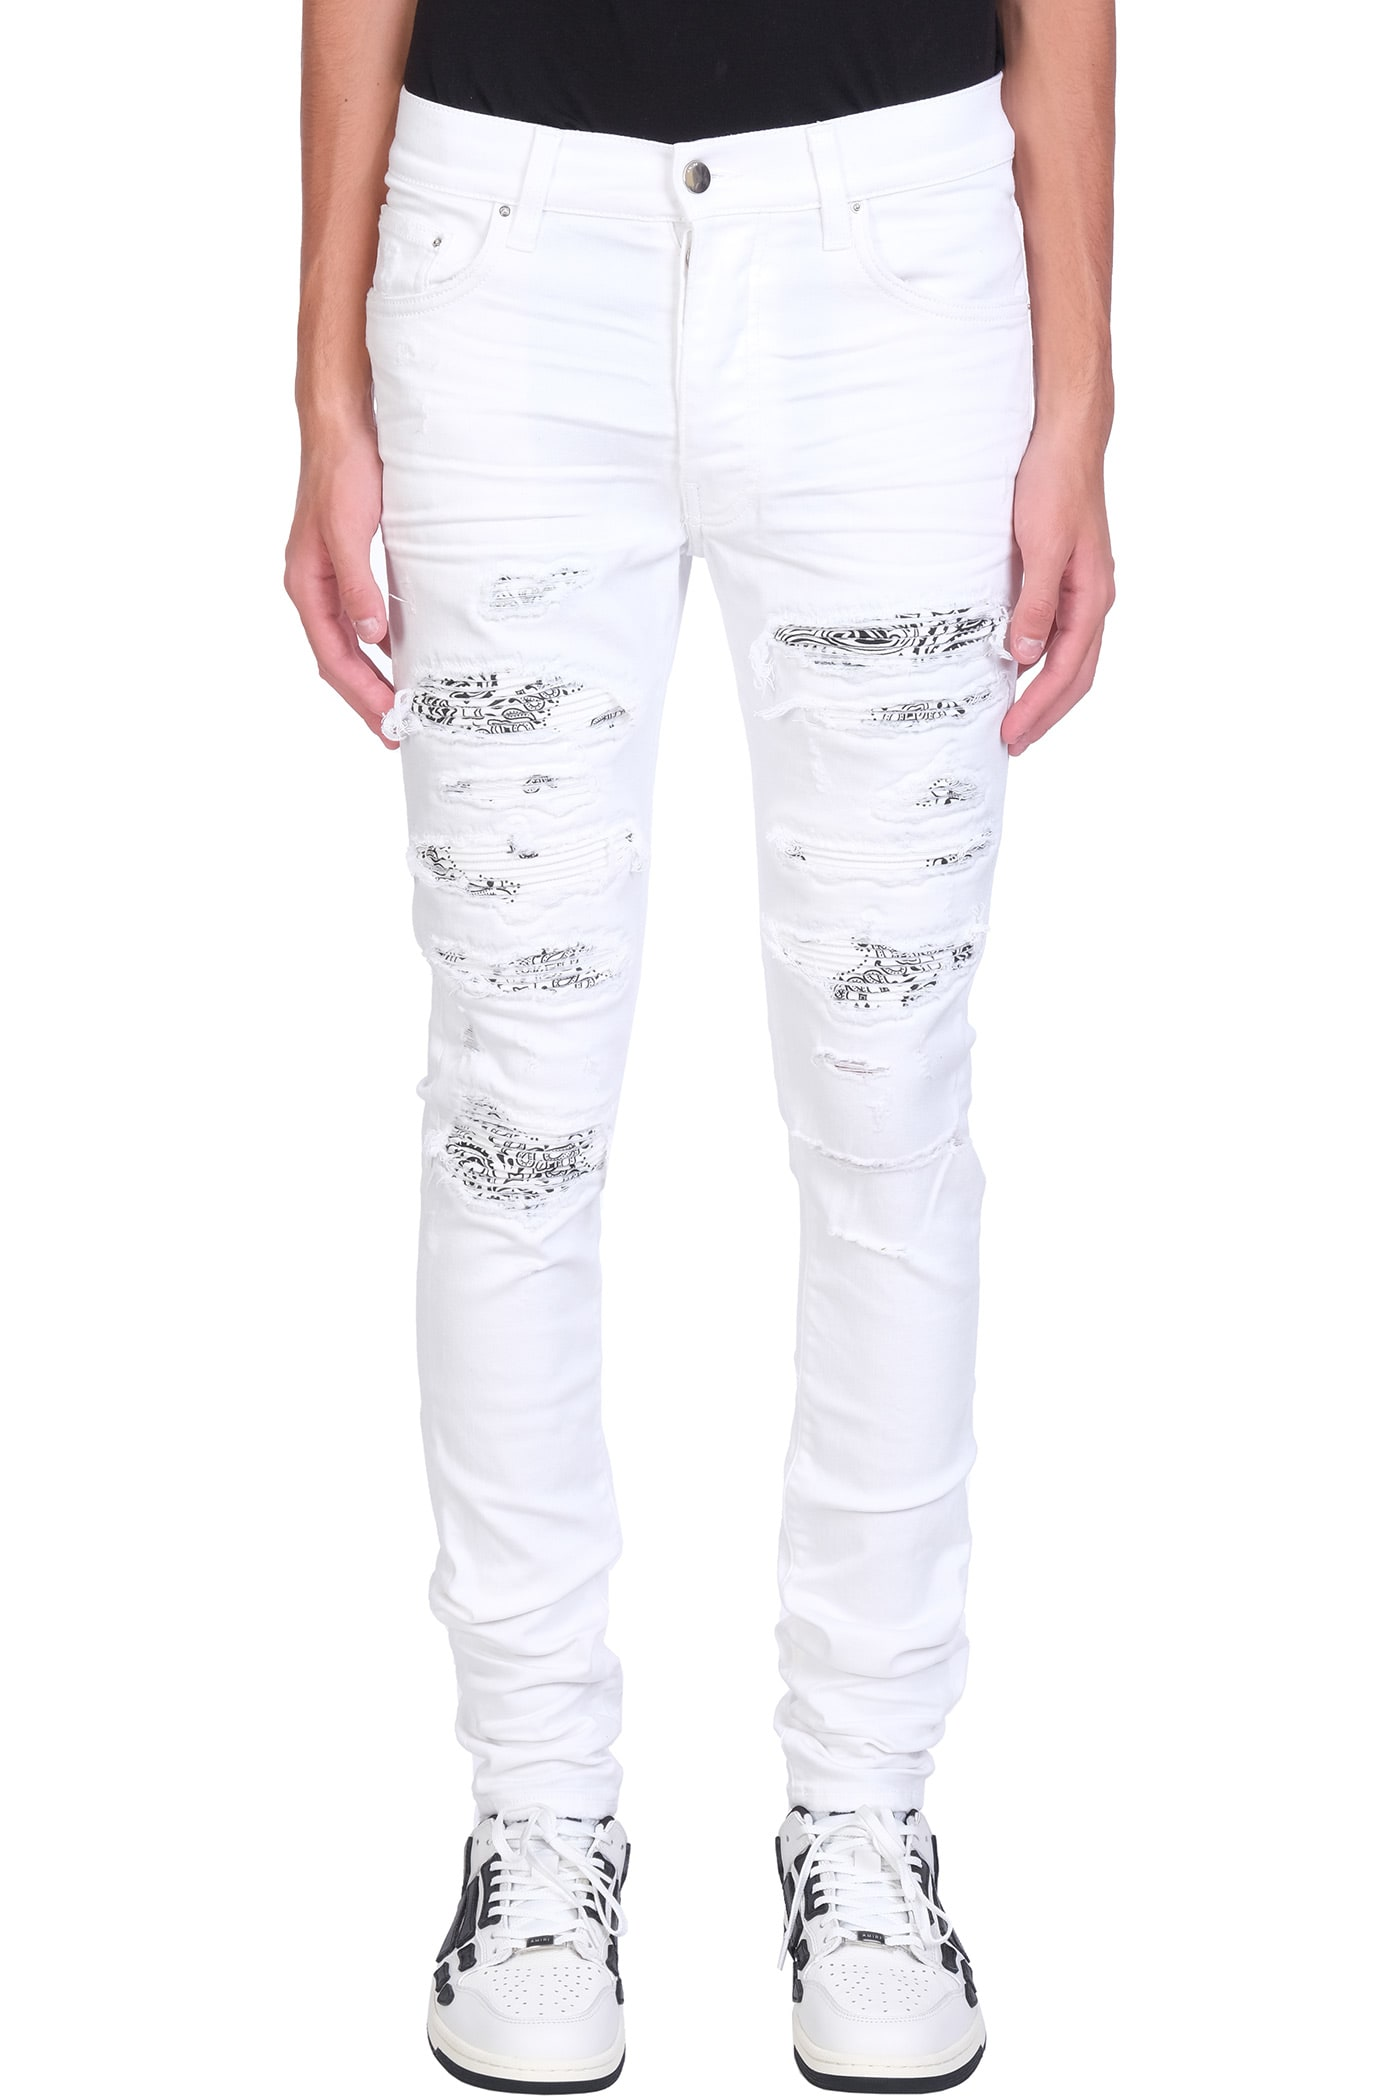 AMIRI Jeans In White Denim